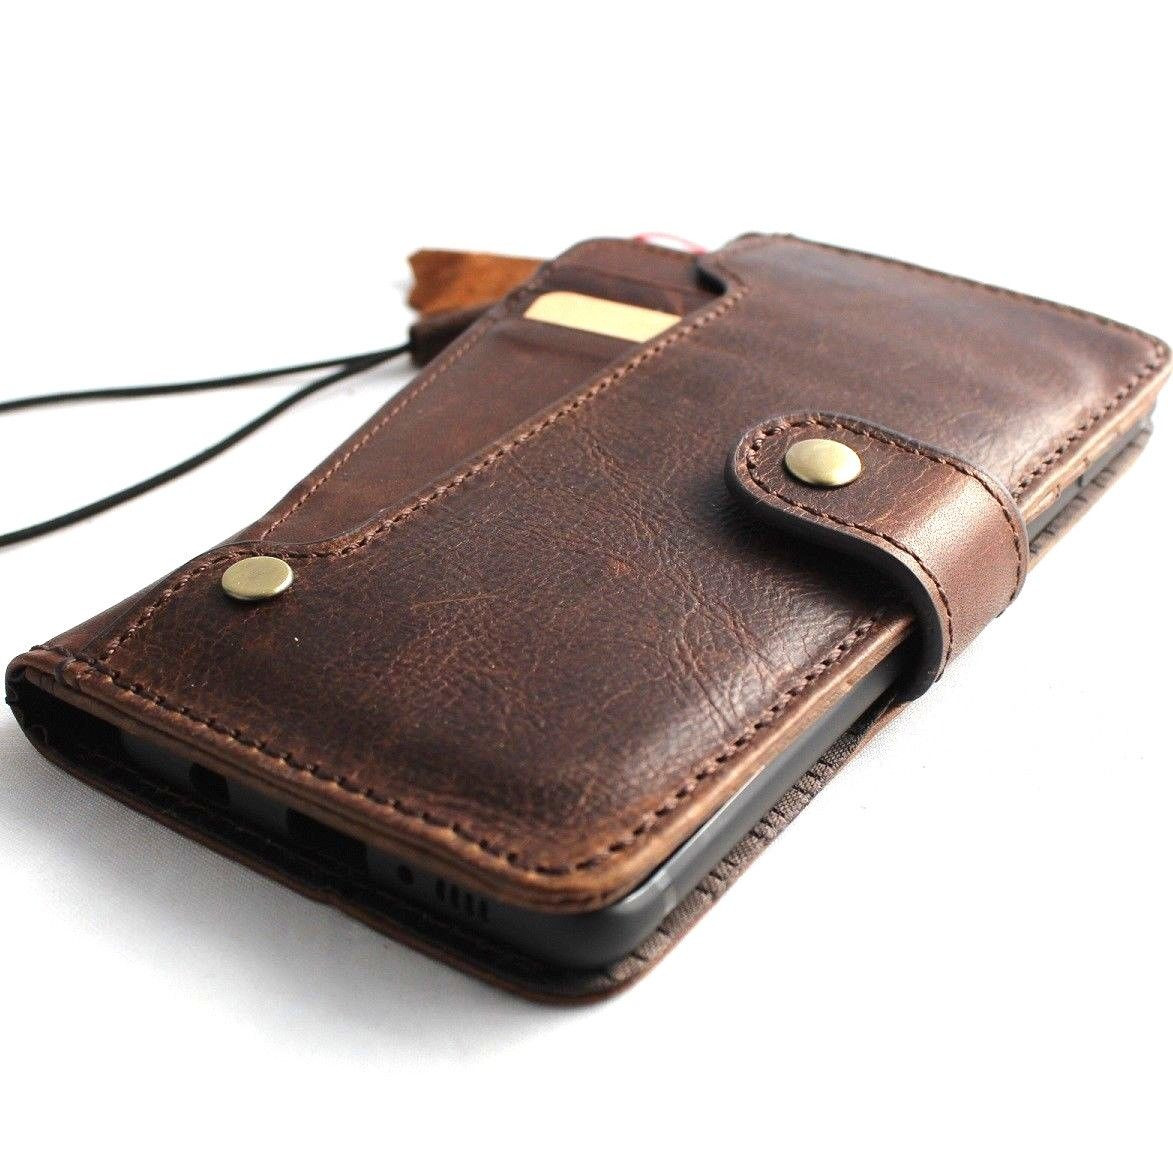 size 40 b4ec1 fc0af Genuine real leather Case for Samsung Galaxy S10 Plus wireless charging  holder vintage book wallet handmade daviscase